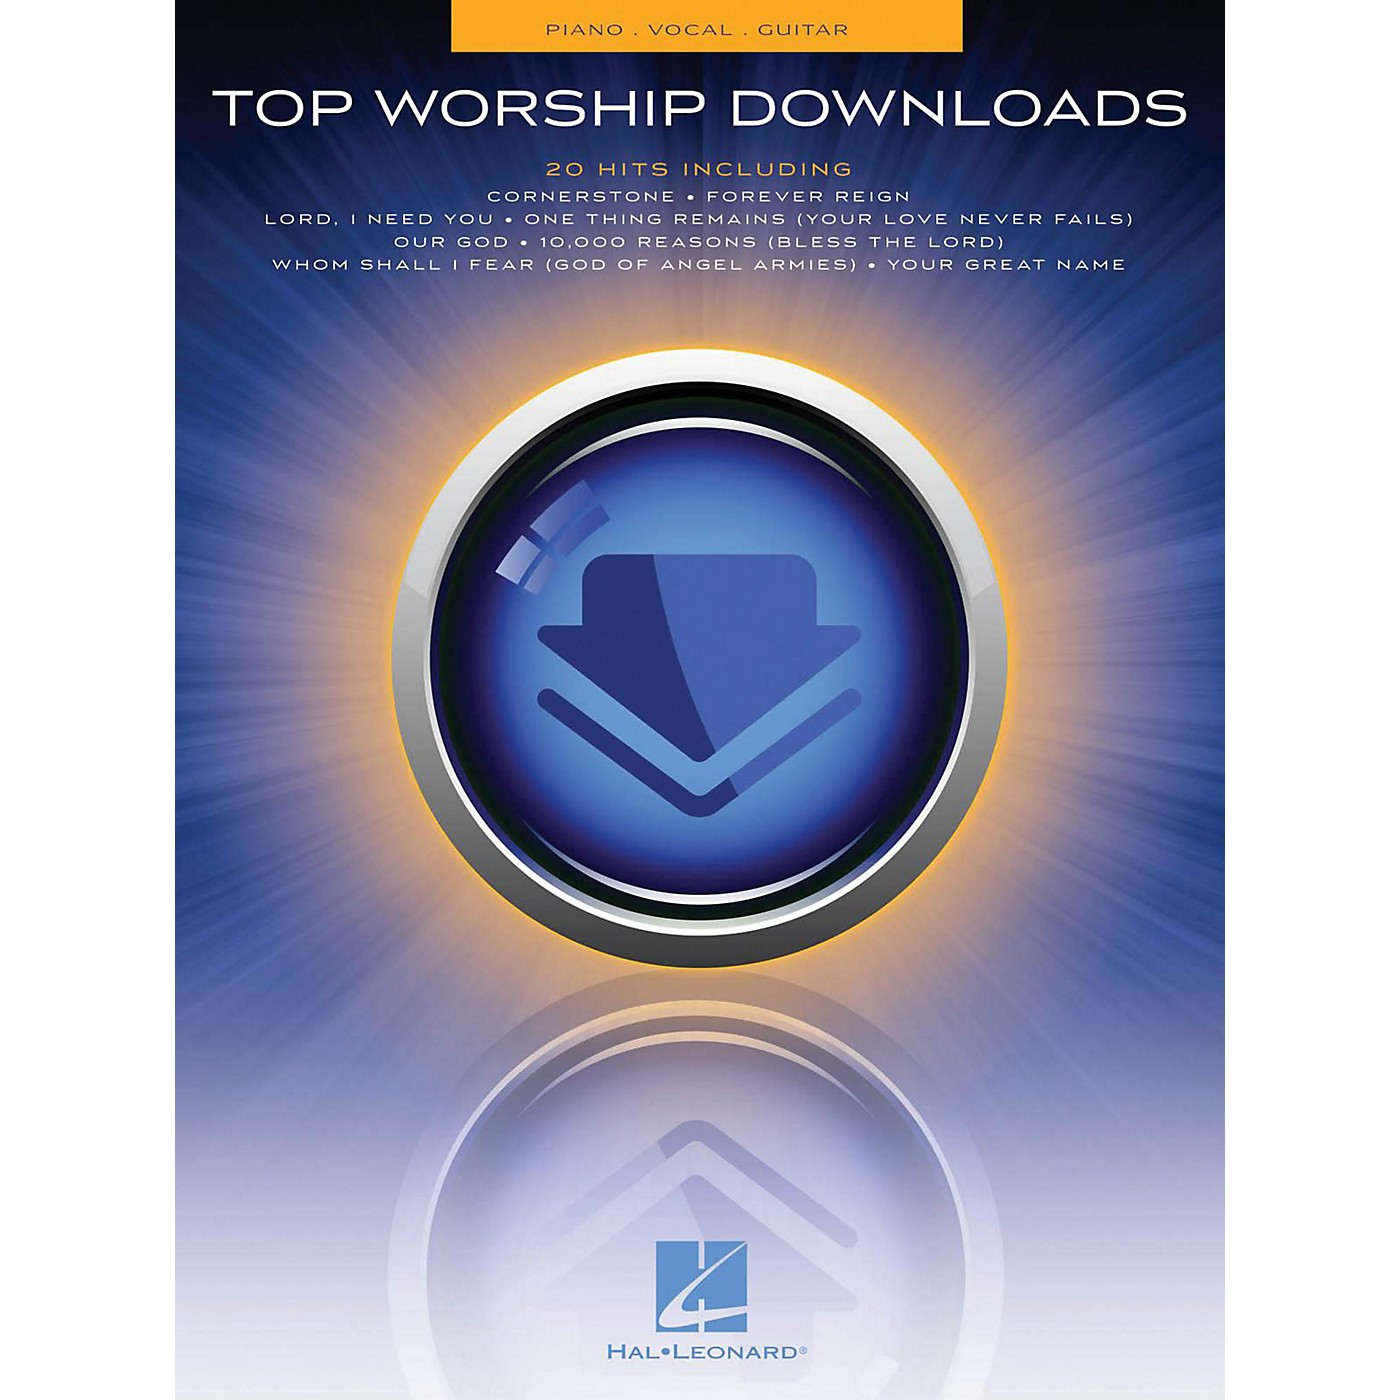 Hal Leonard Top Worship Downloads Piano/Vocal/Guitar (PVG) thumbnail